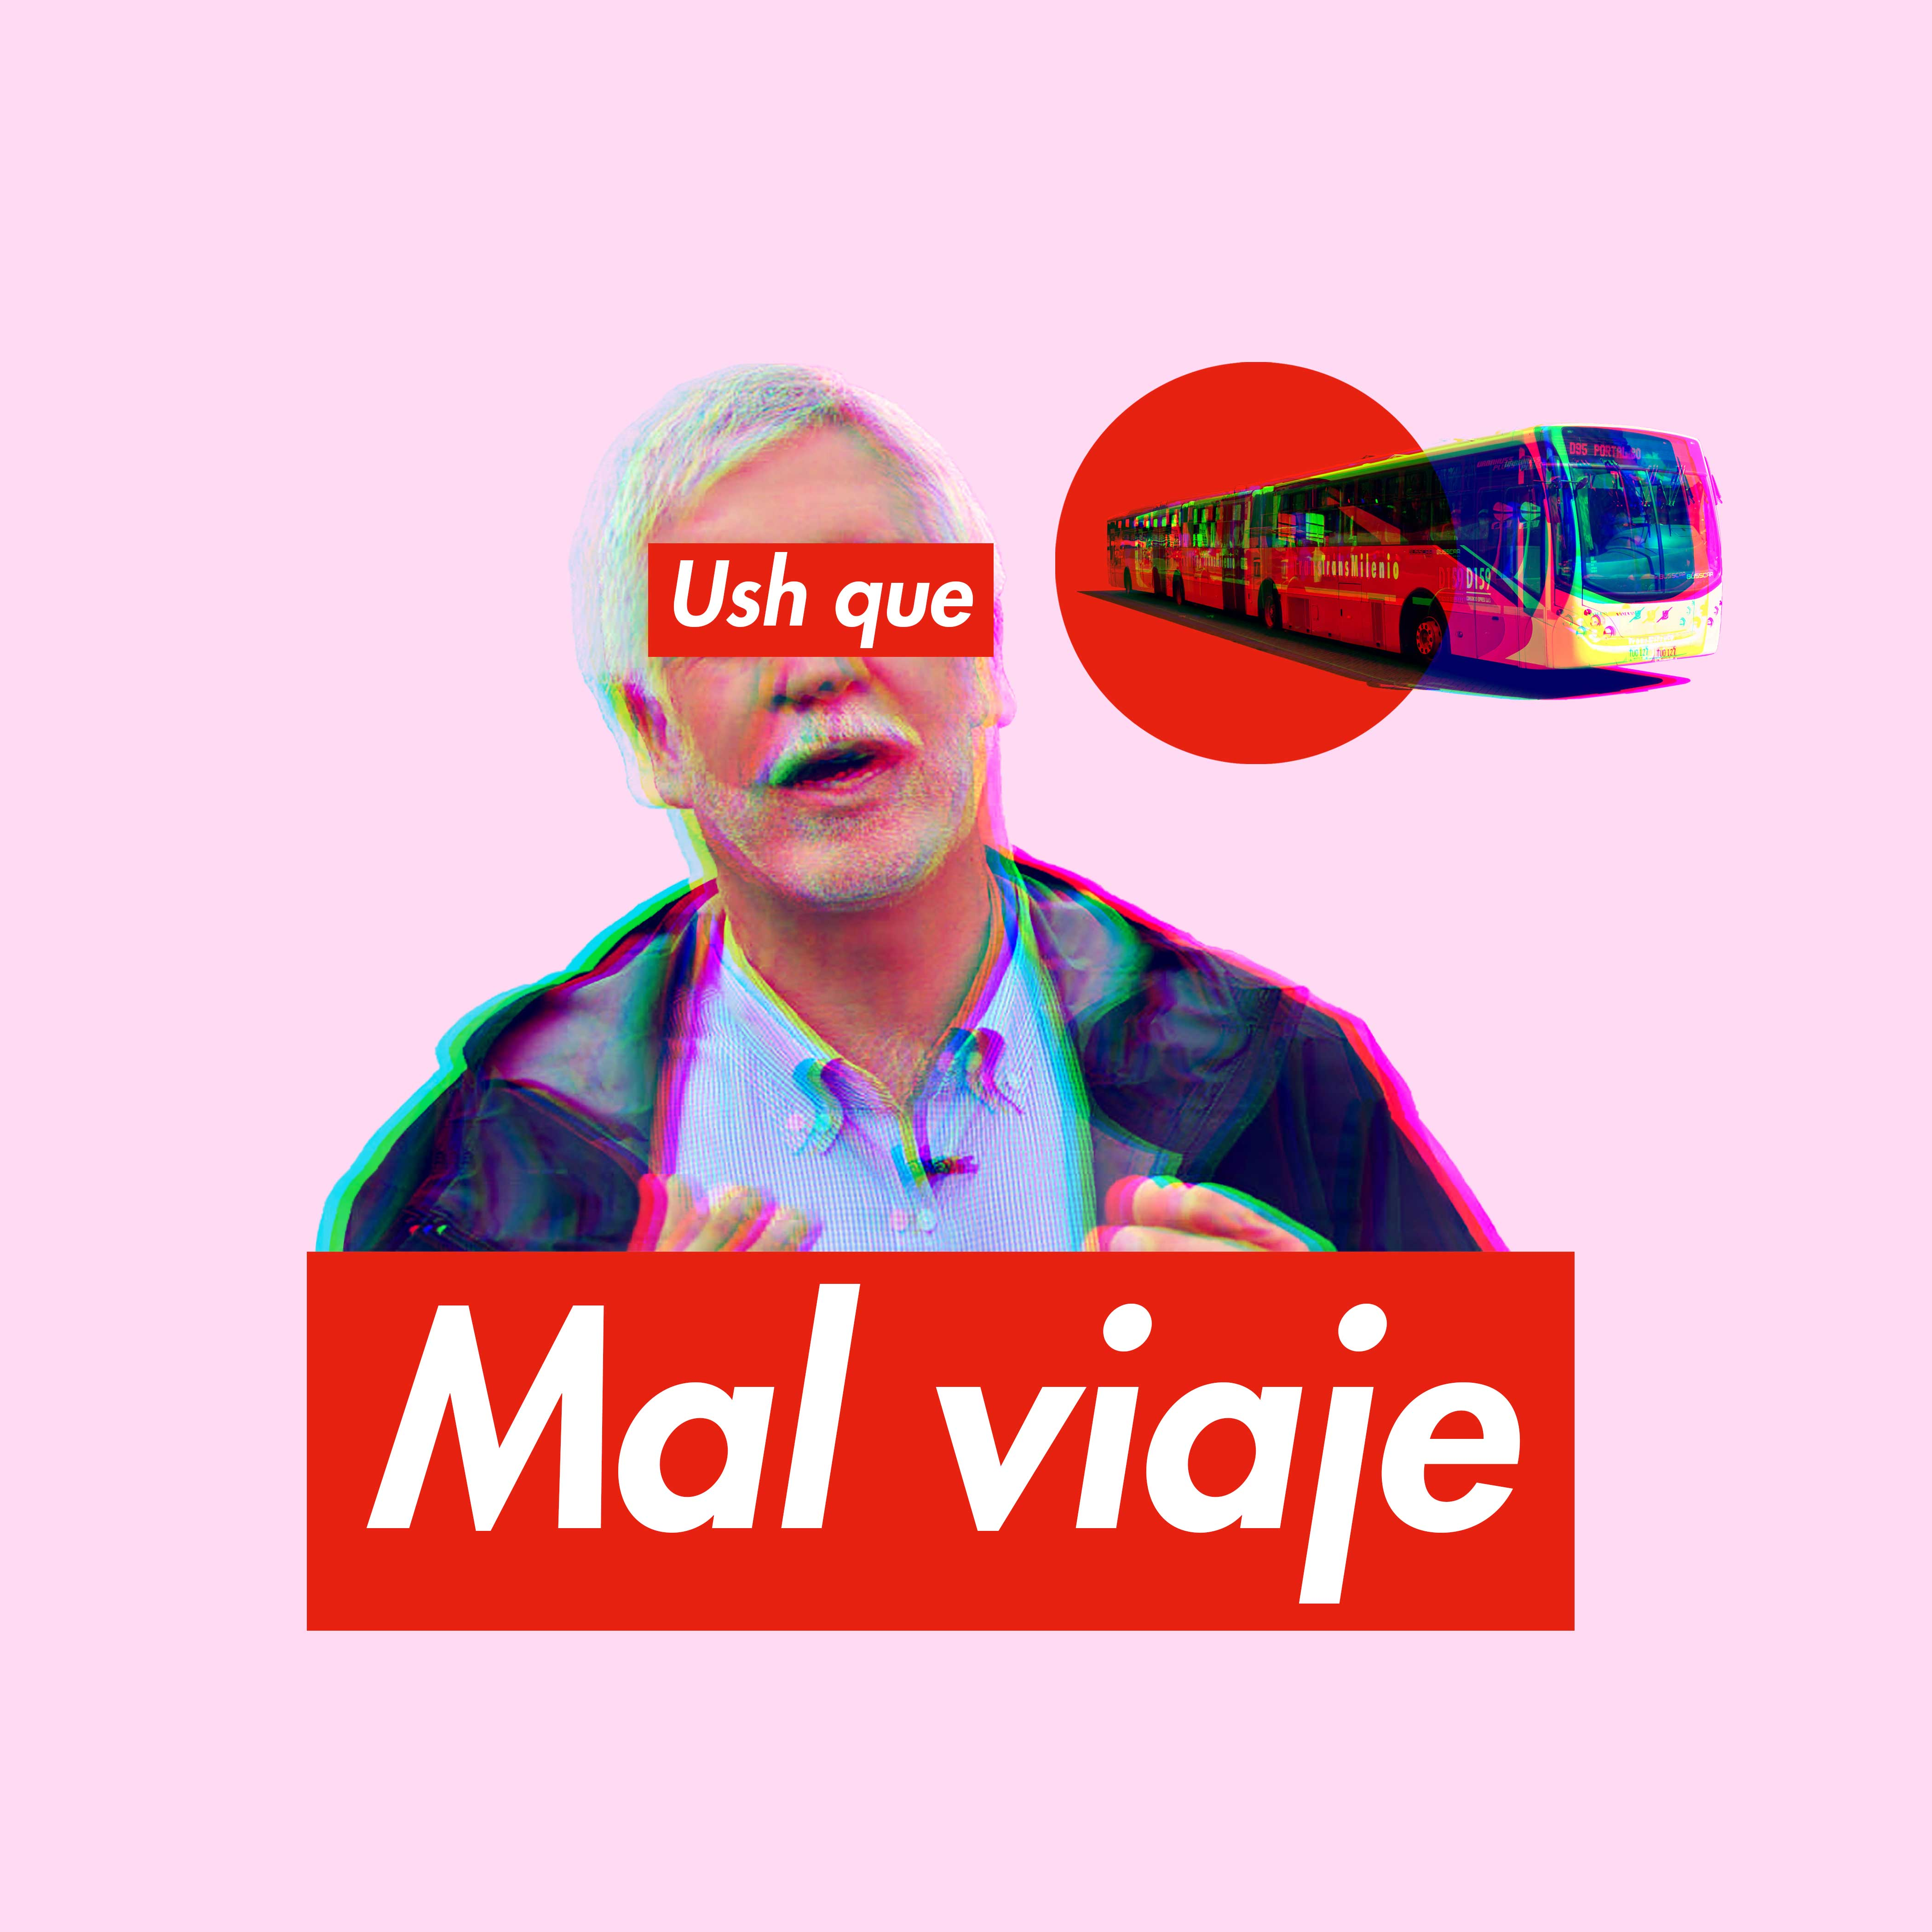 ush-que-malviaje_0.jpg